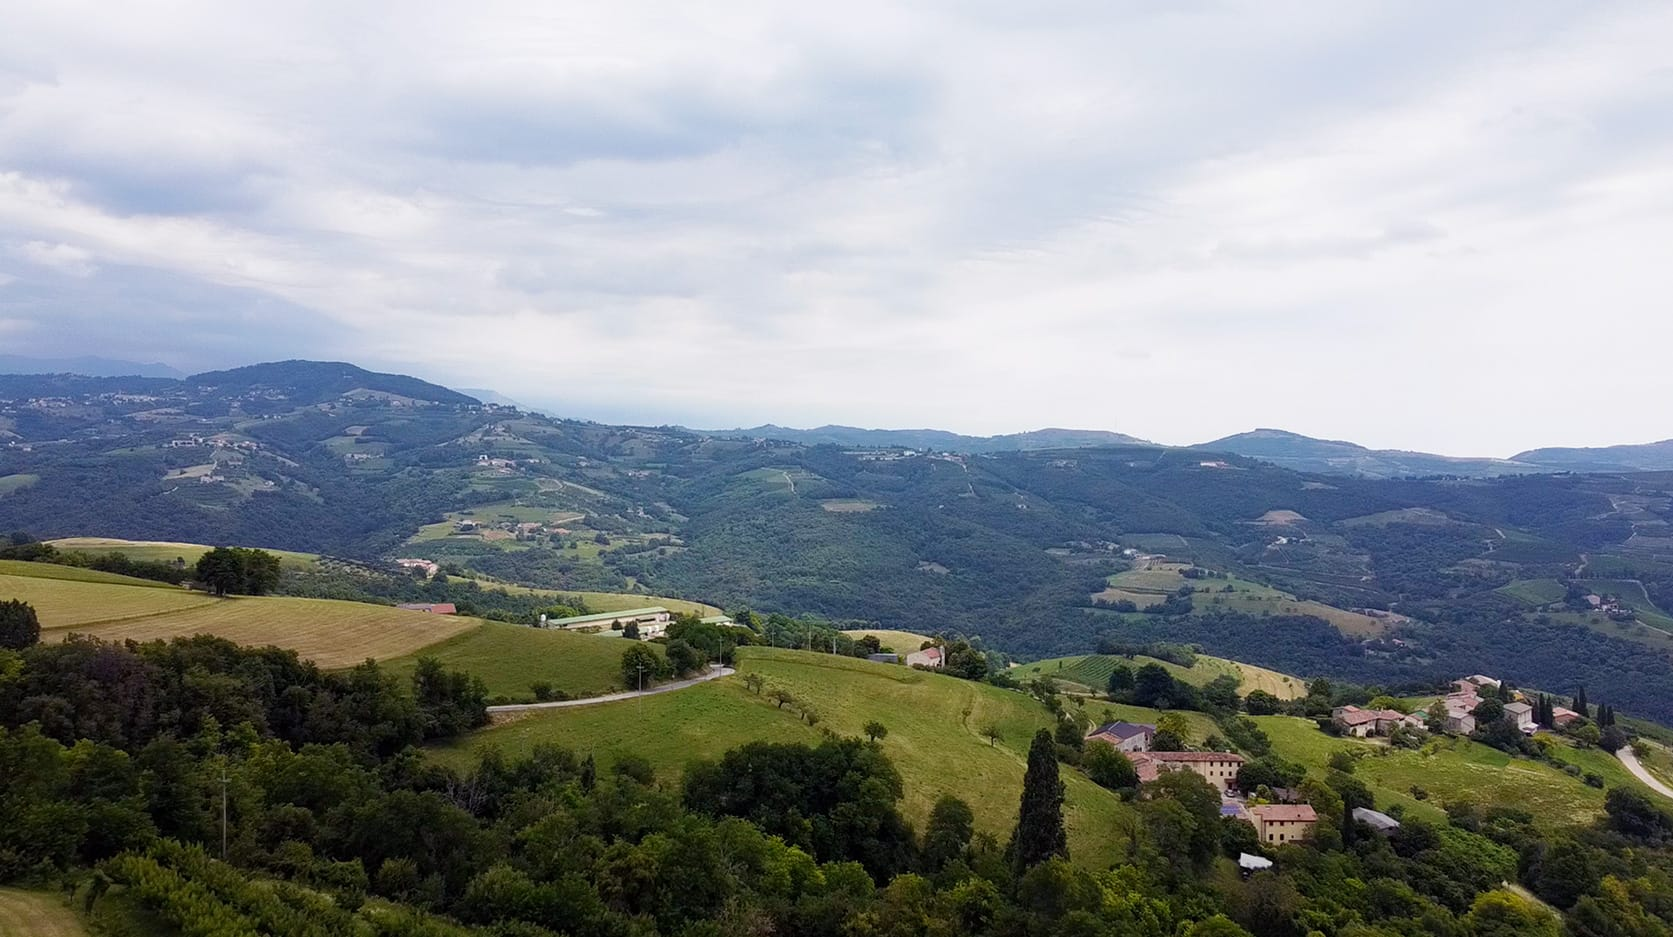 Lessinia foto aerea prato verde